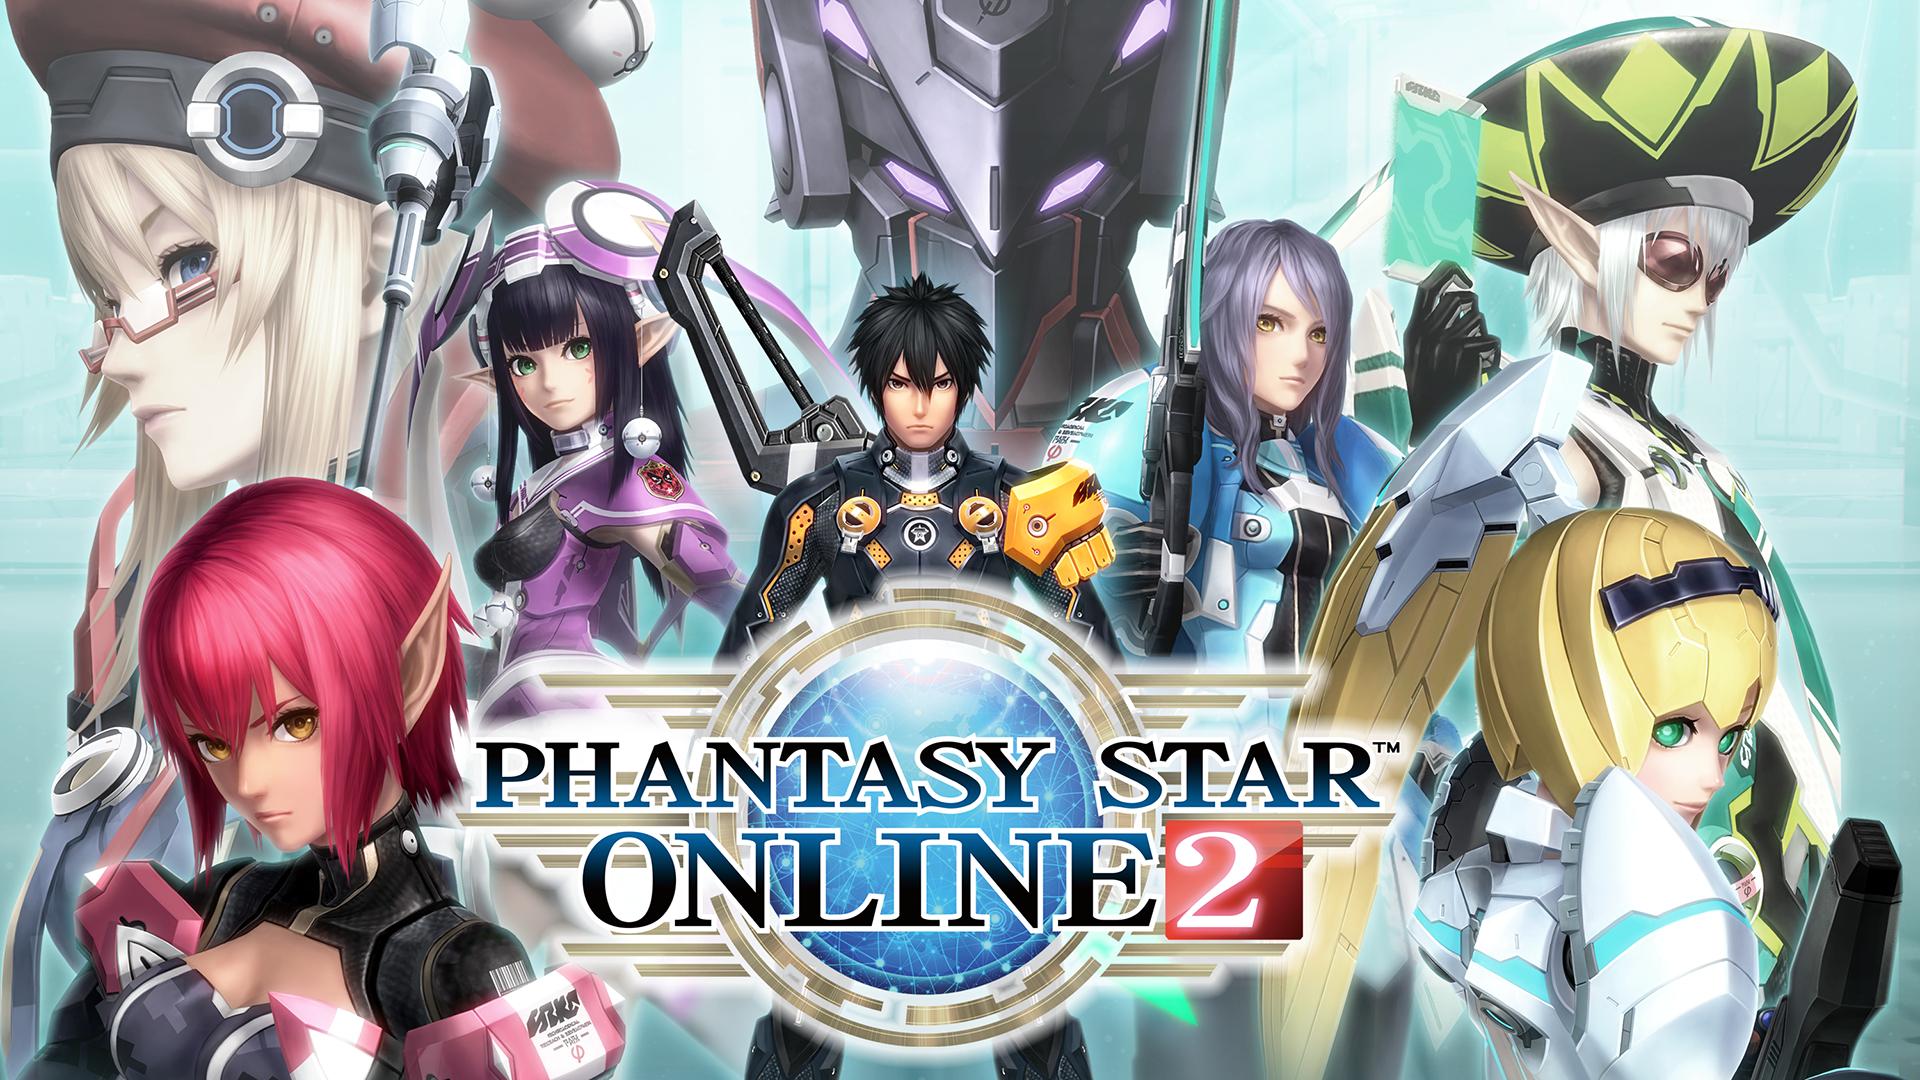 DewaGG | Phantasy Star Online 2 akan hadir di Steam pada 5 Agustus - DewaGG